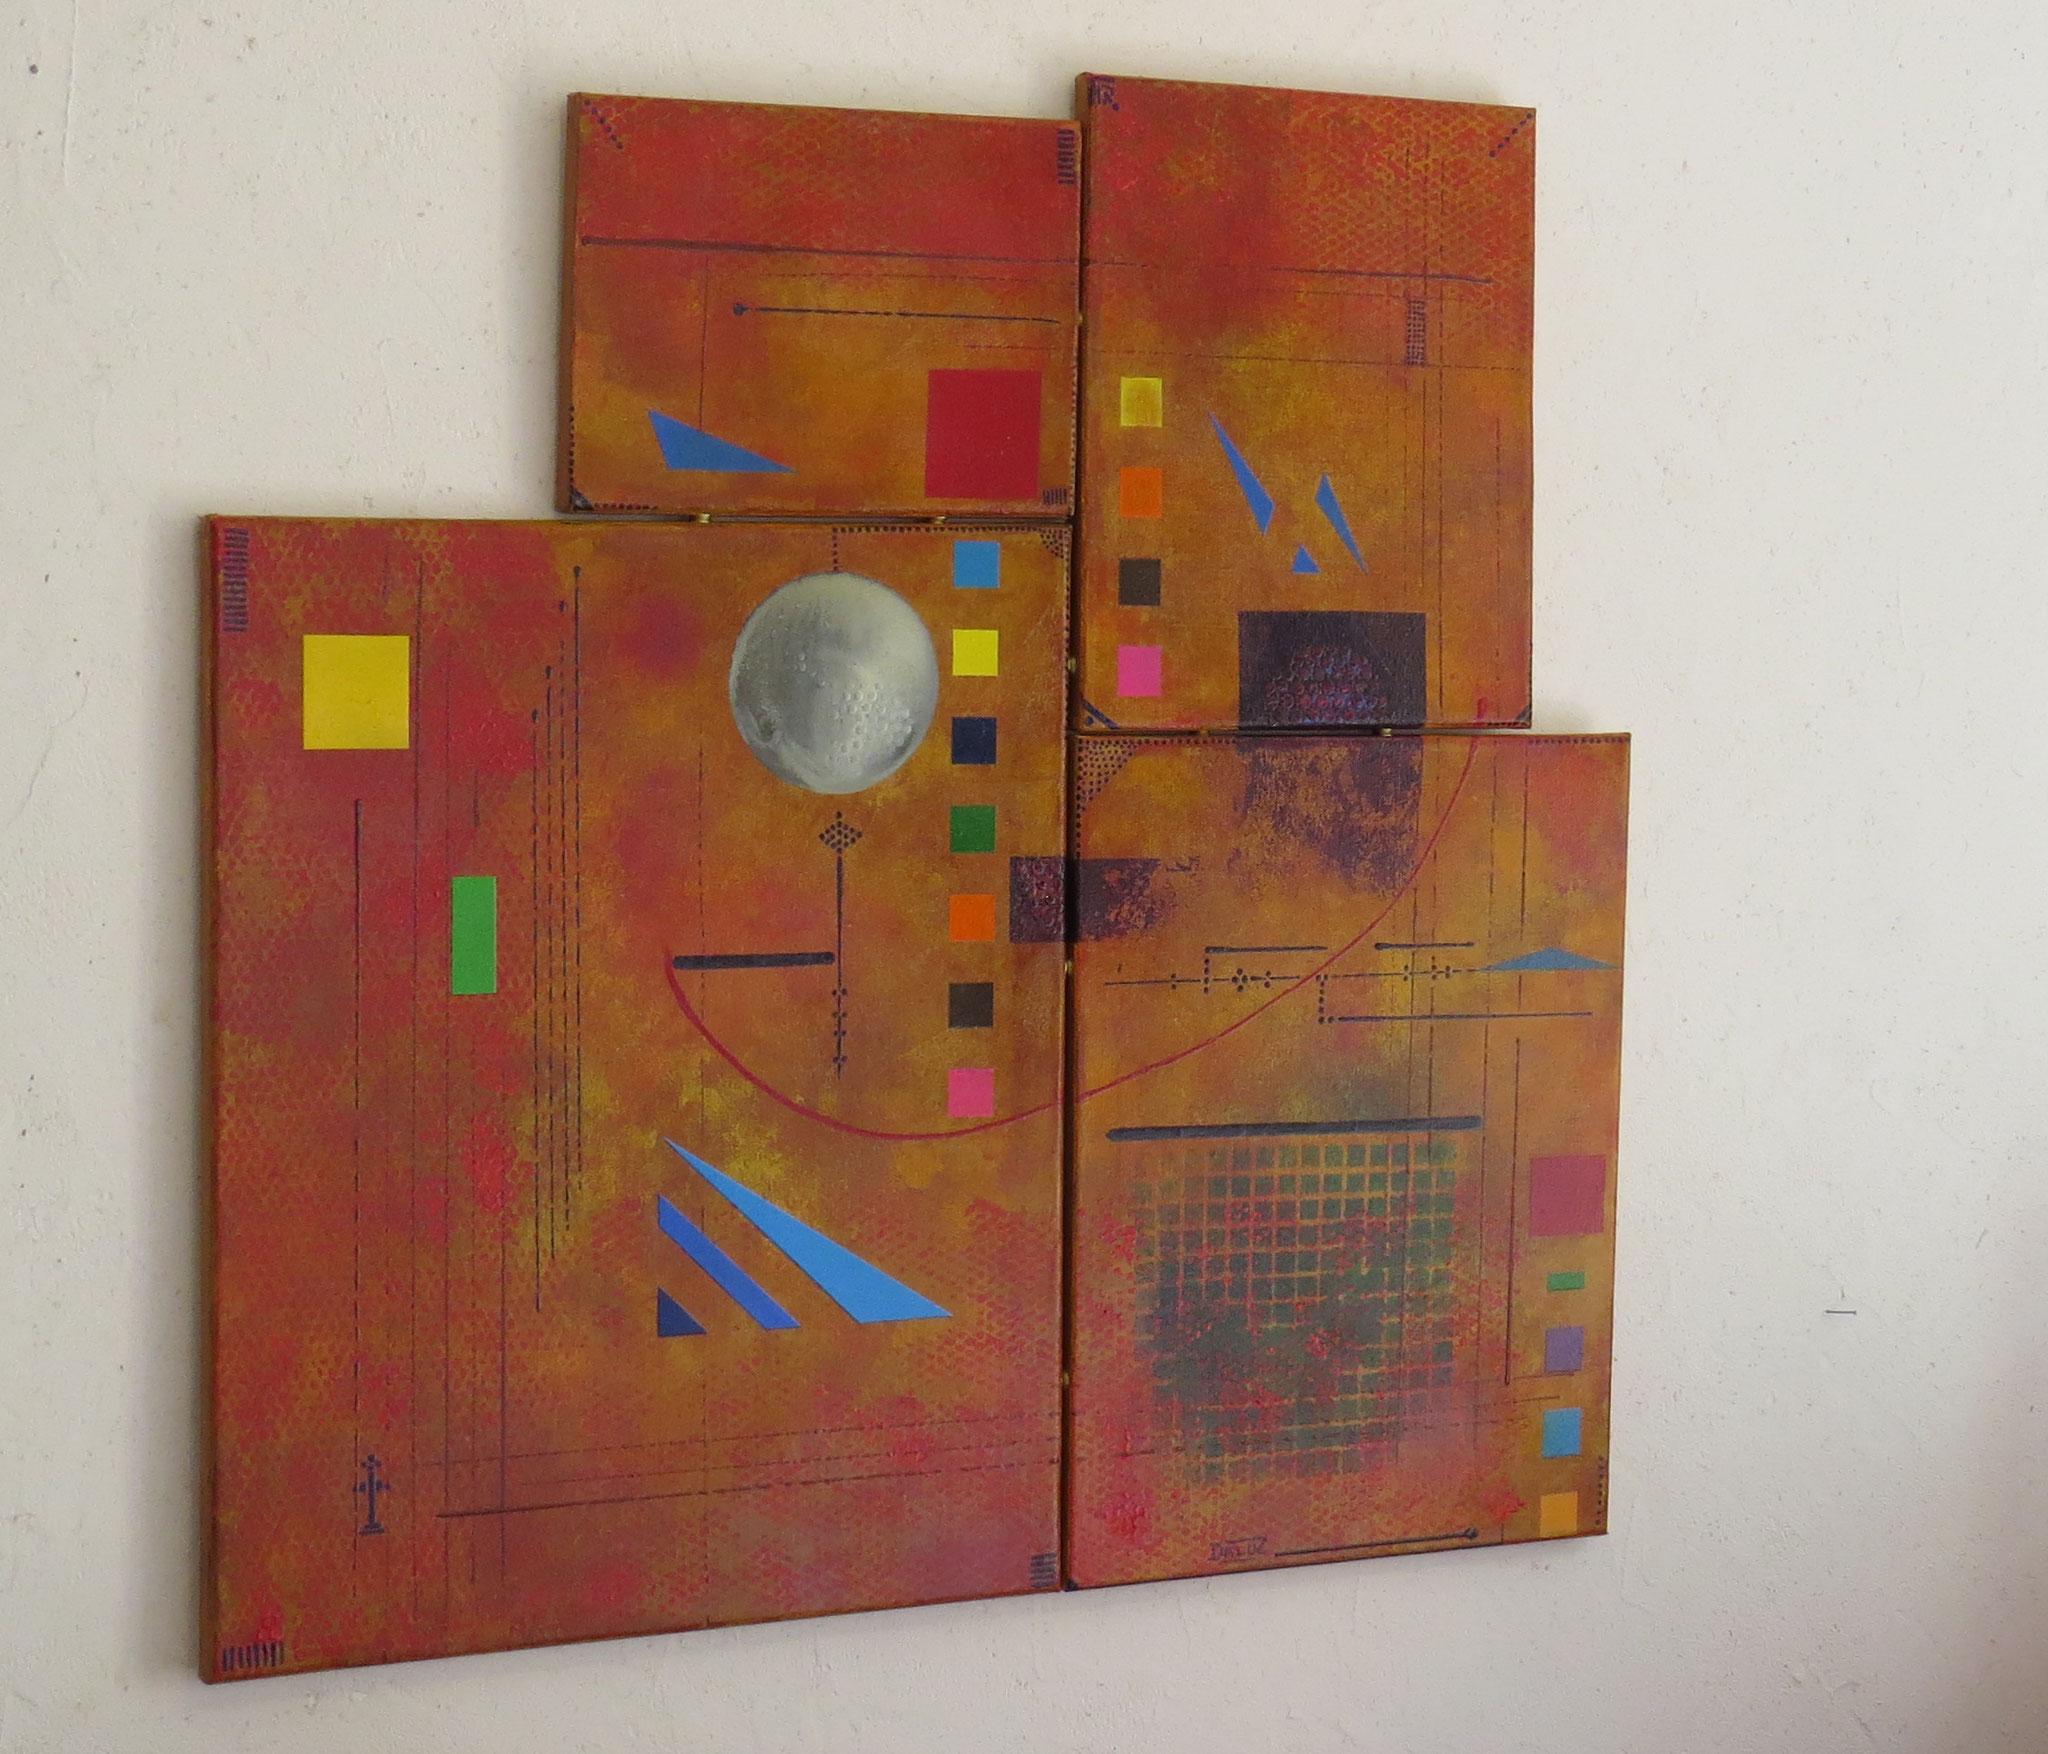 sigma - vue côté1 - DALUZ GALEGO - peinture abstraite